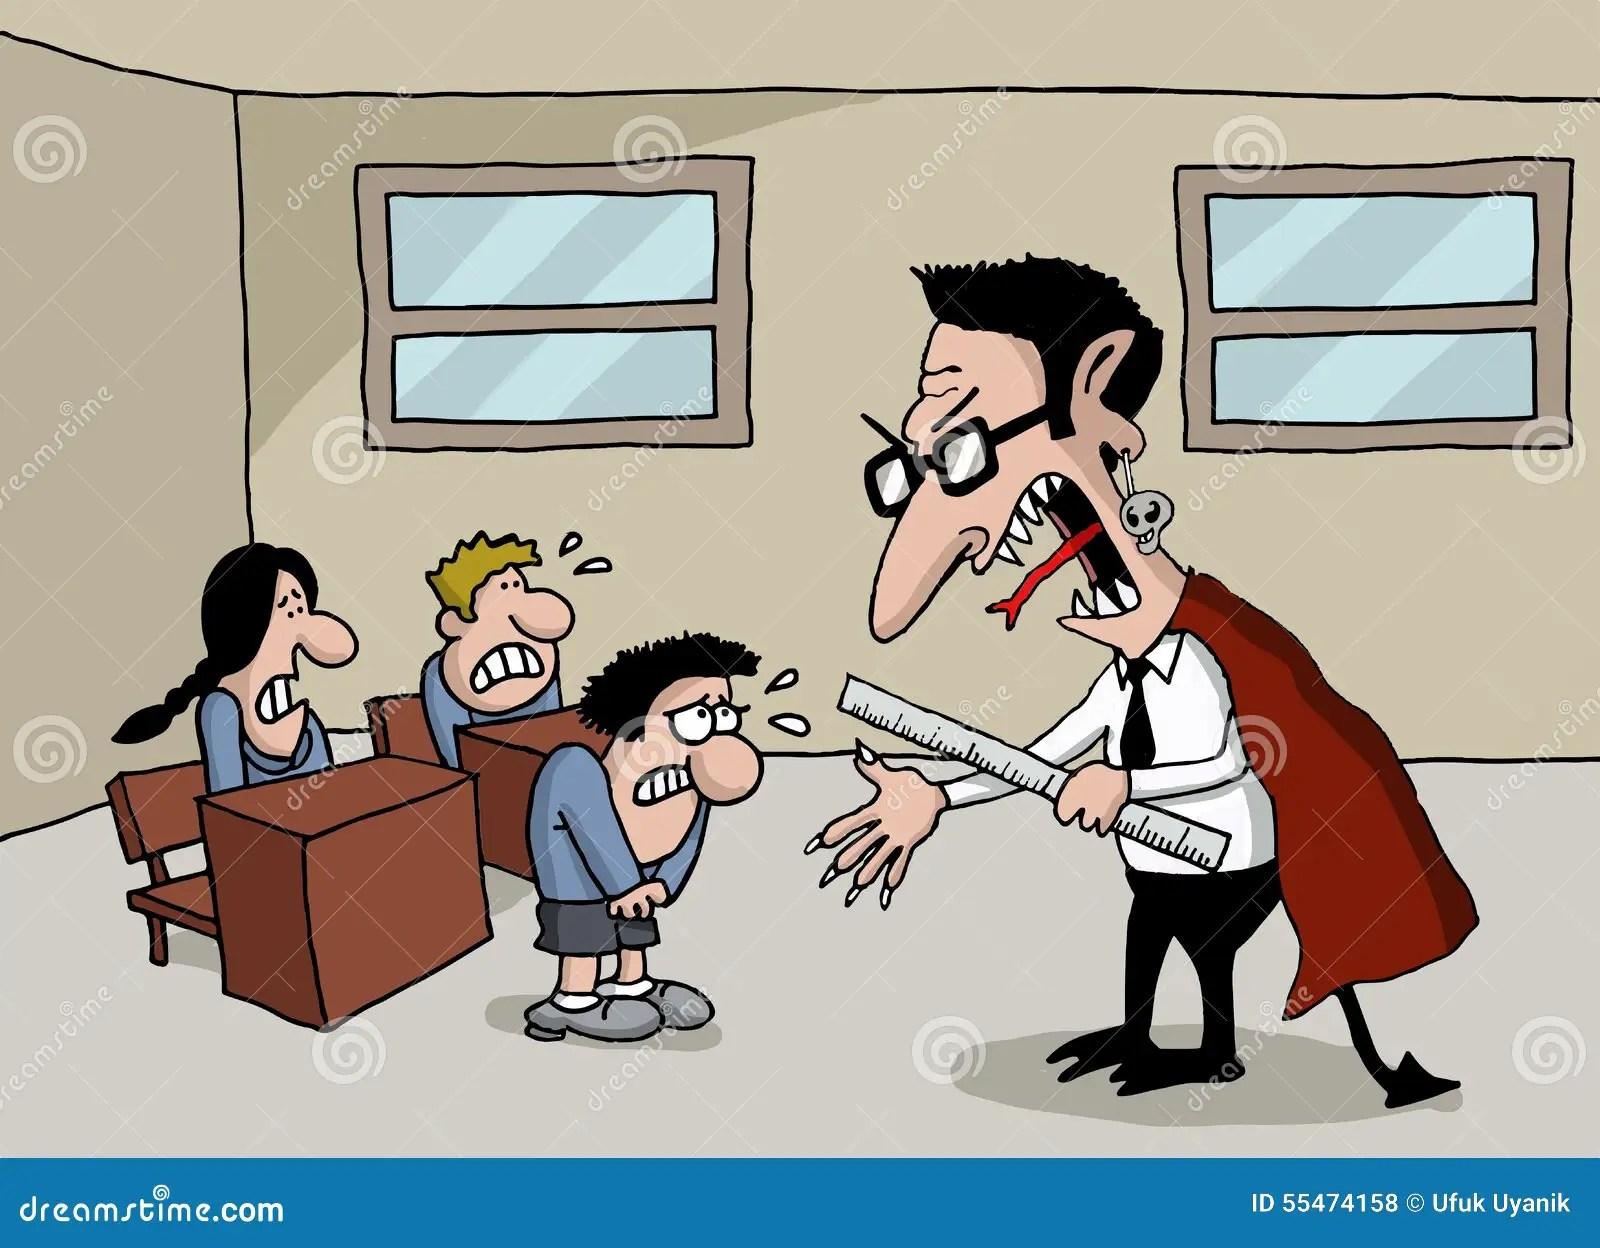 Cartoon Of A Monster Teacher In School Stock Illustration